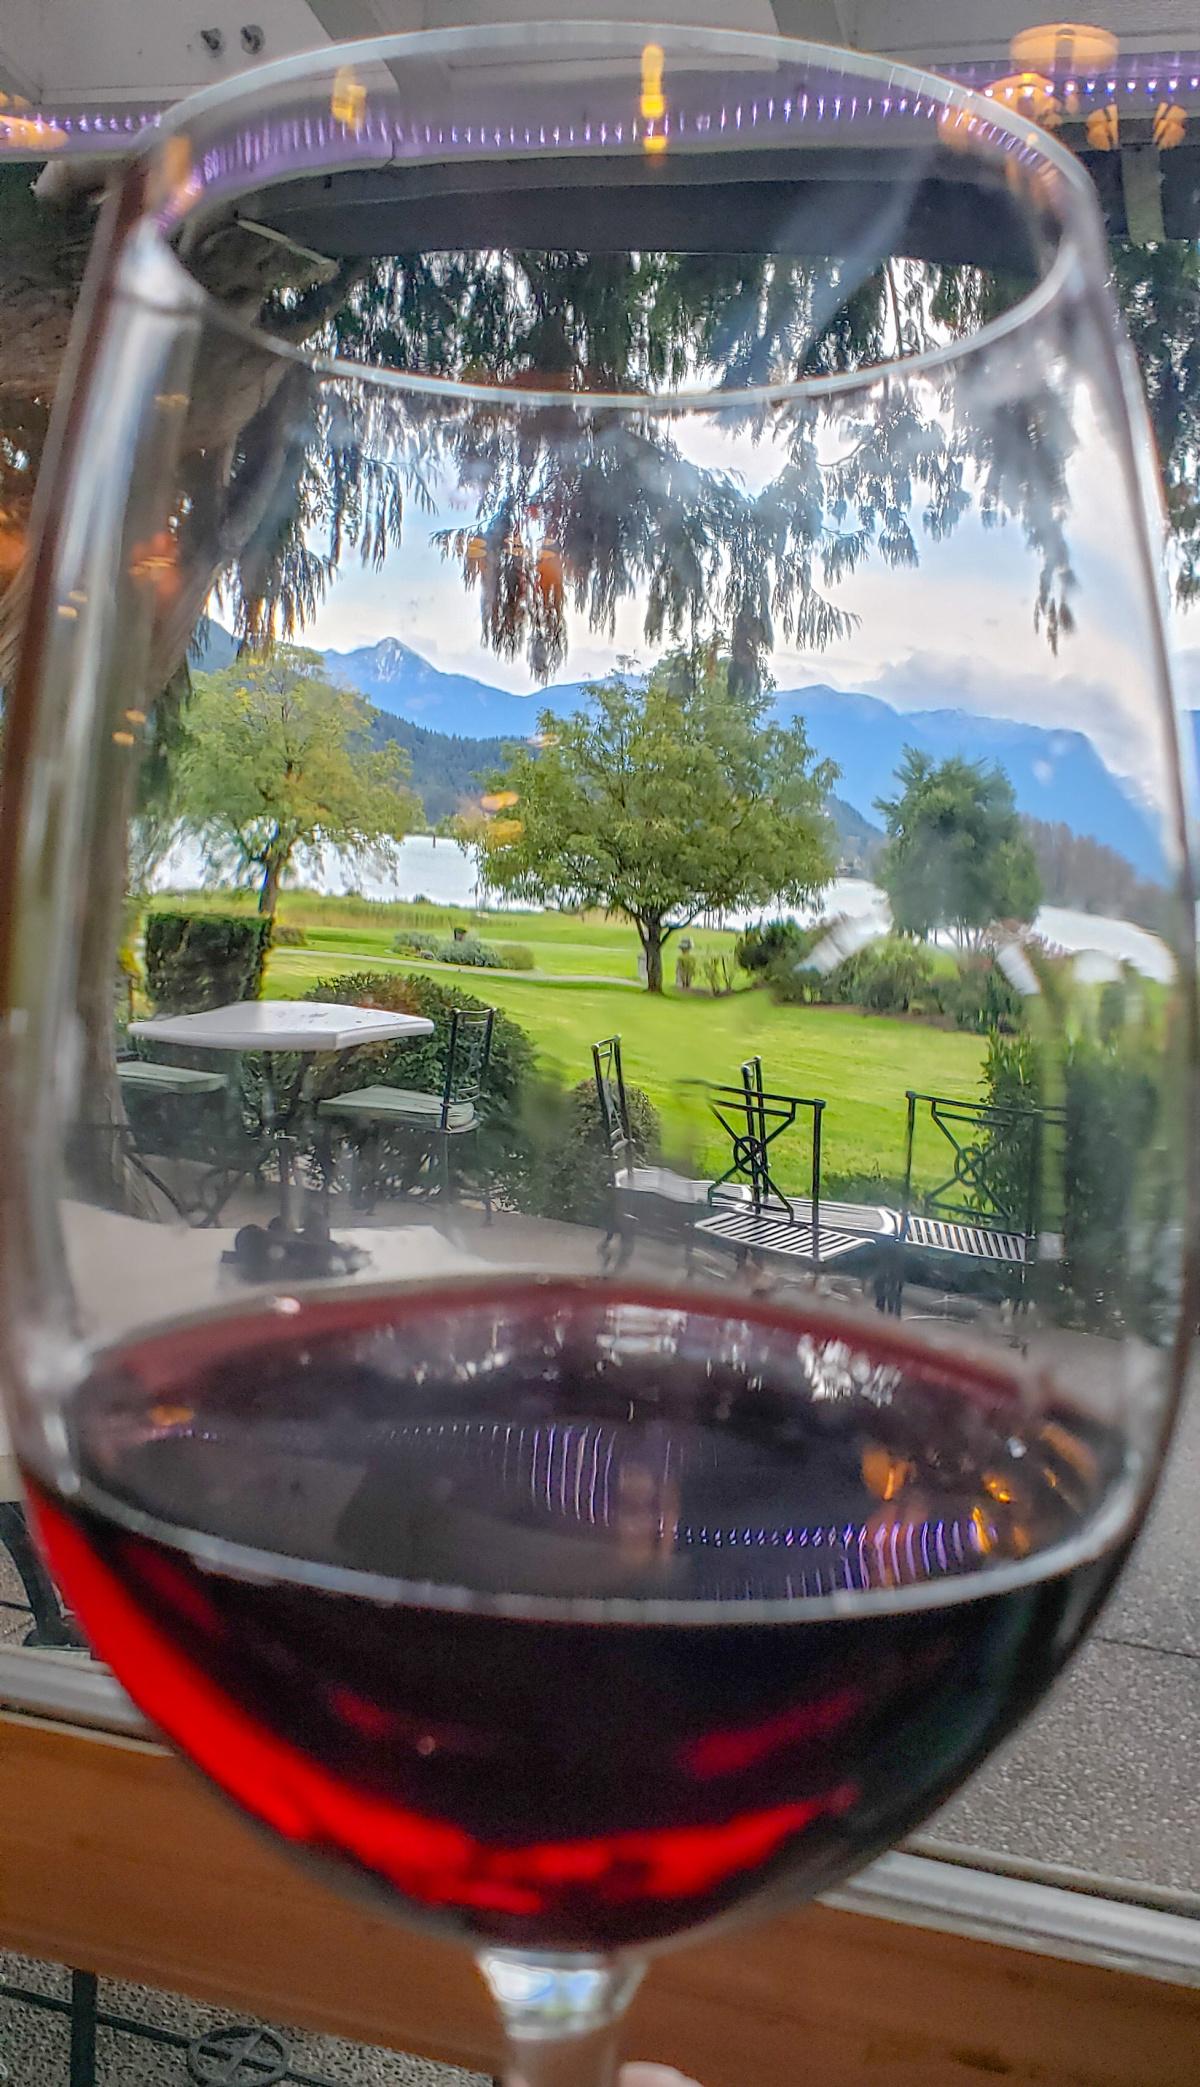 River's Edge golf course view through a wine glass